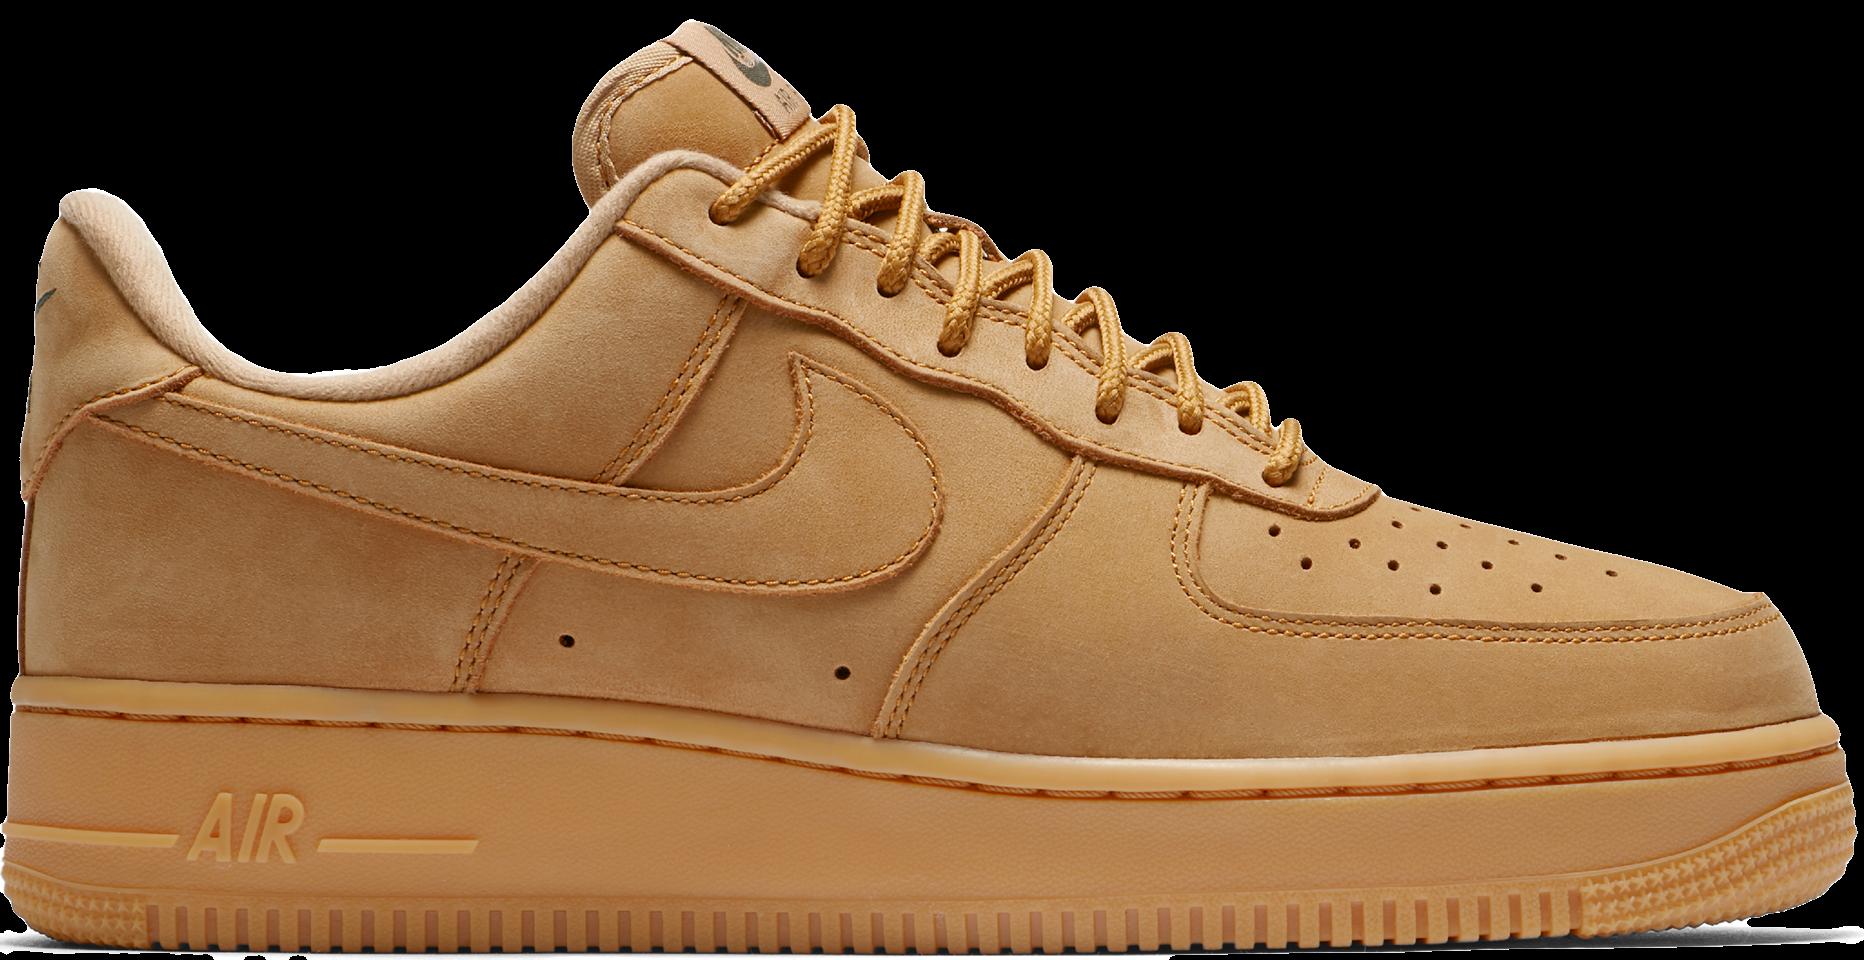 Nike Air Force 1 '07 WB - Sneaker - Herren